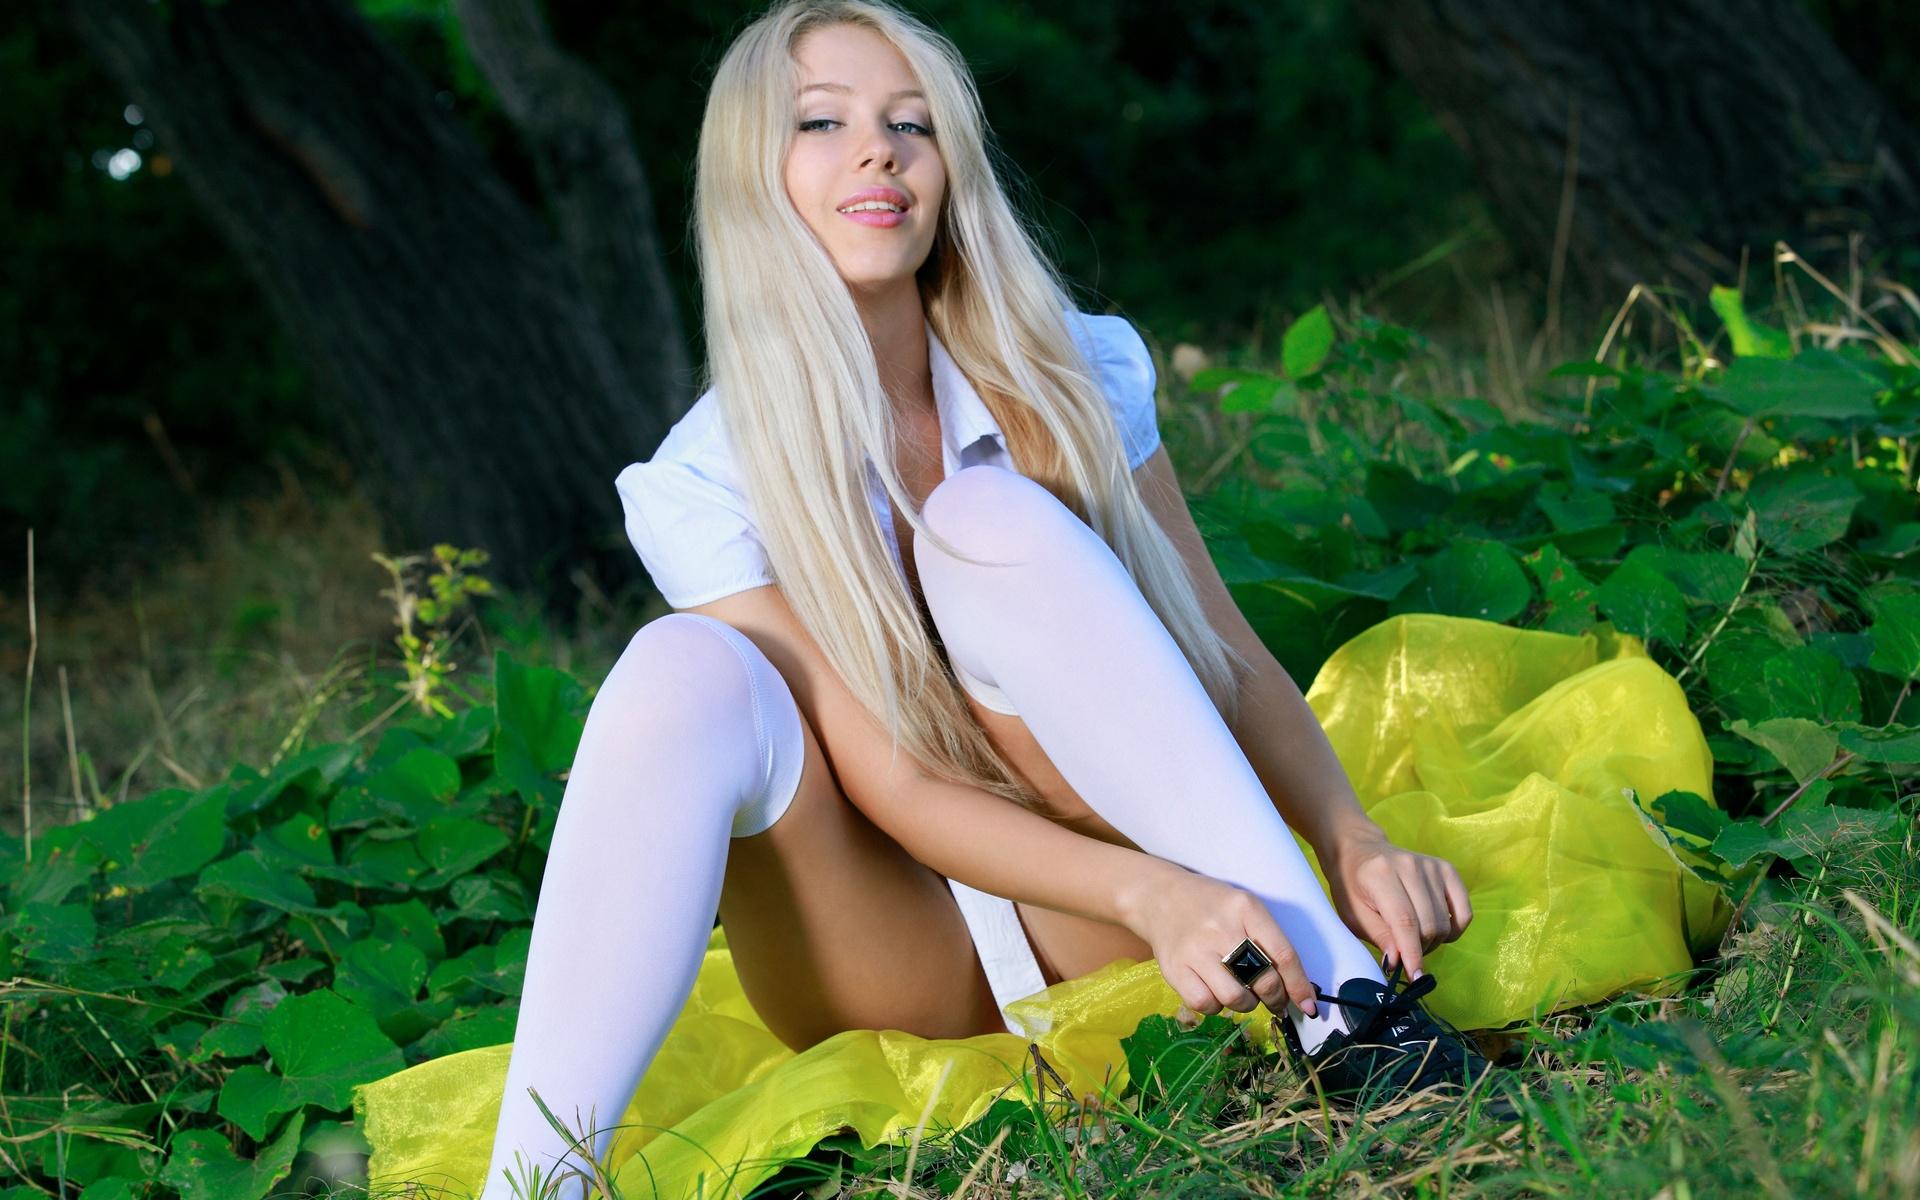 Девушки в белых чулках на природе